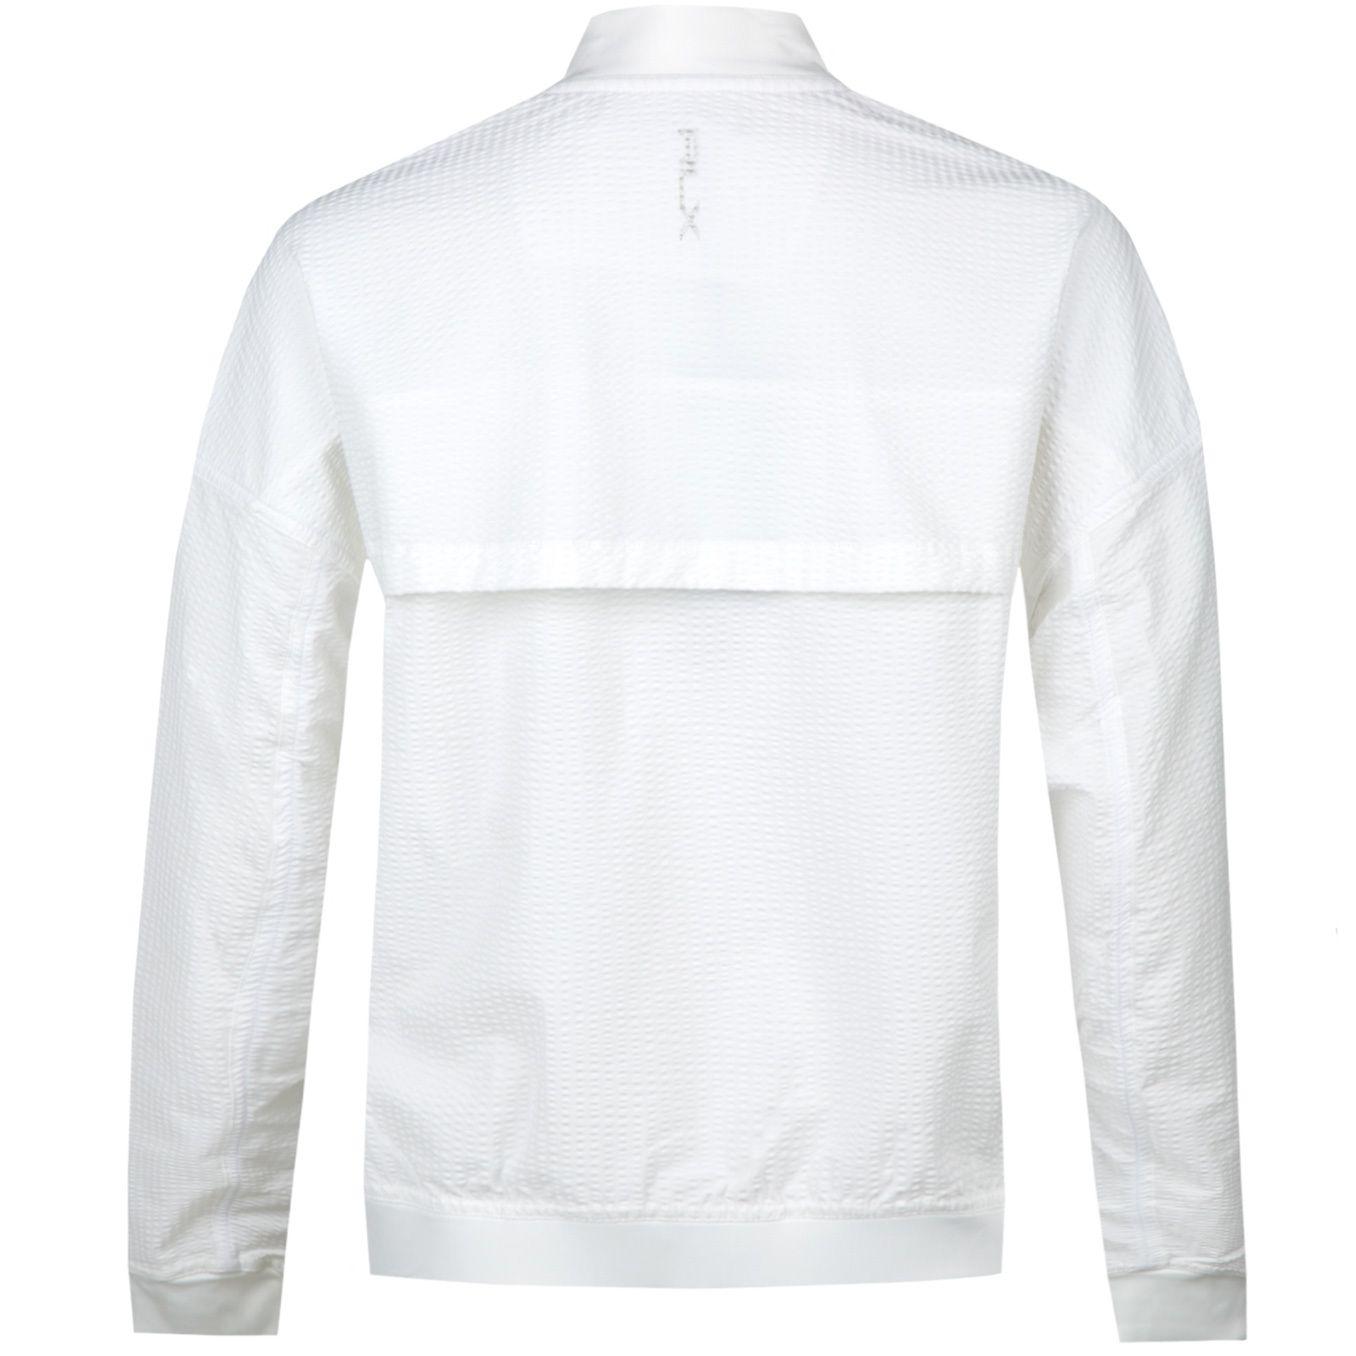 Womens Seersucker Jacket Pure White Aw18 Jacket Polo Ralph